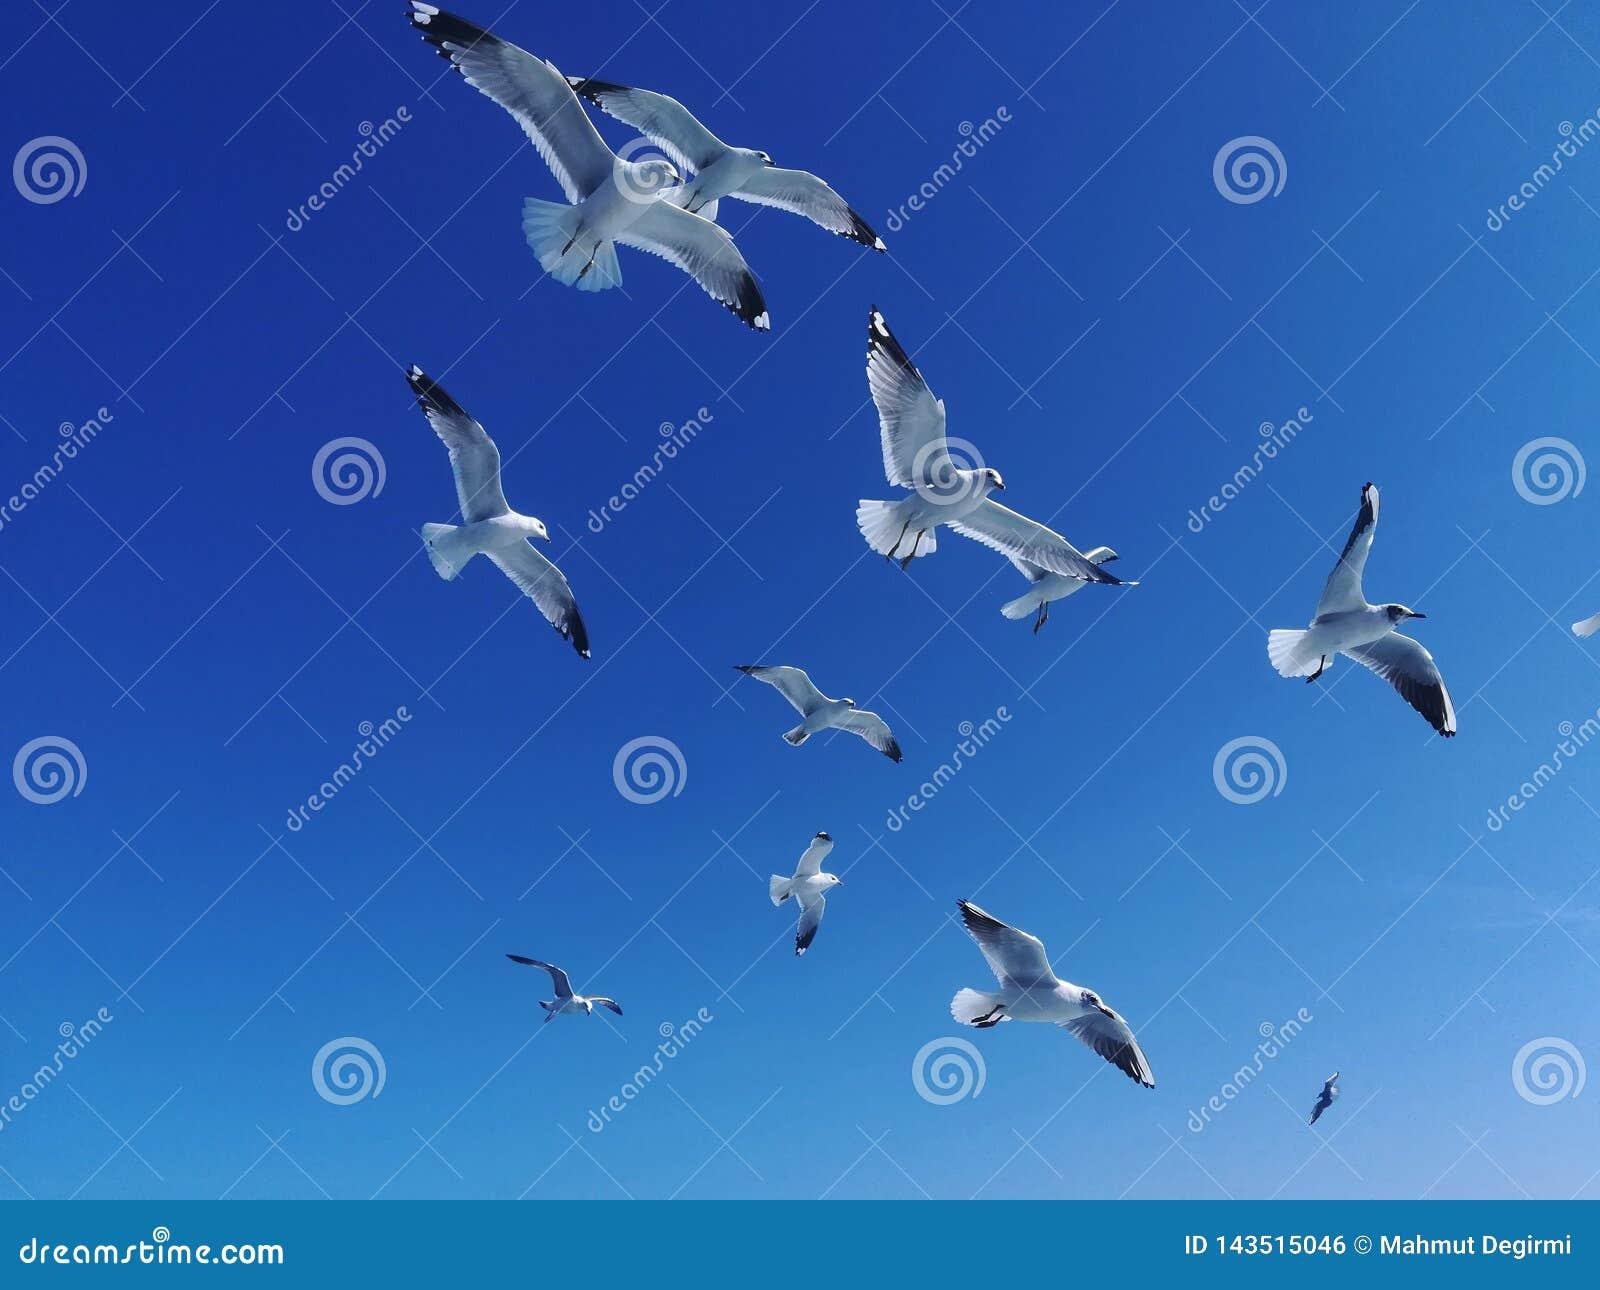 Un grupo de gaviotas blancas está volando